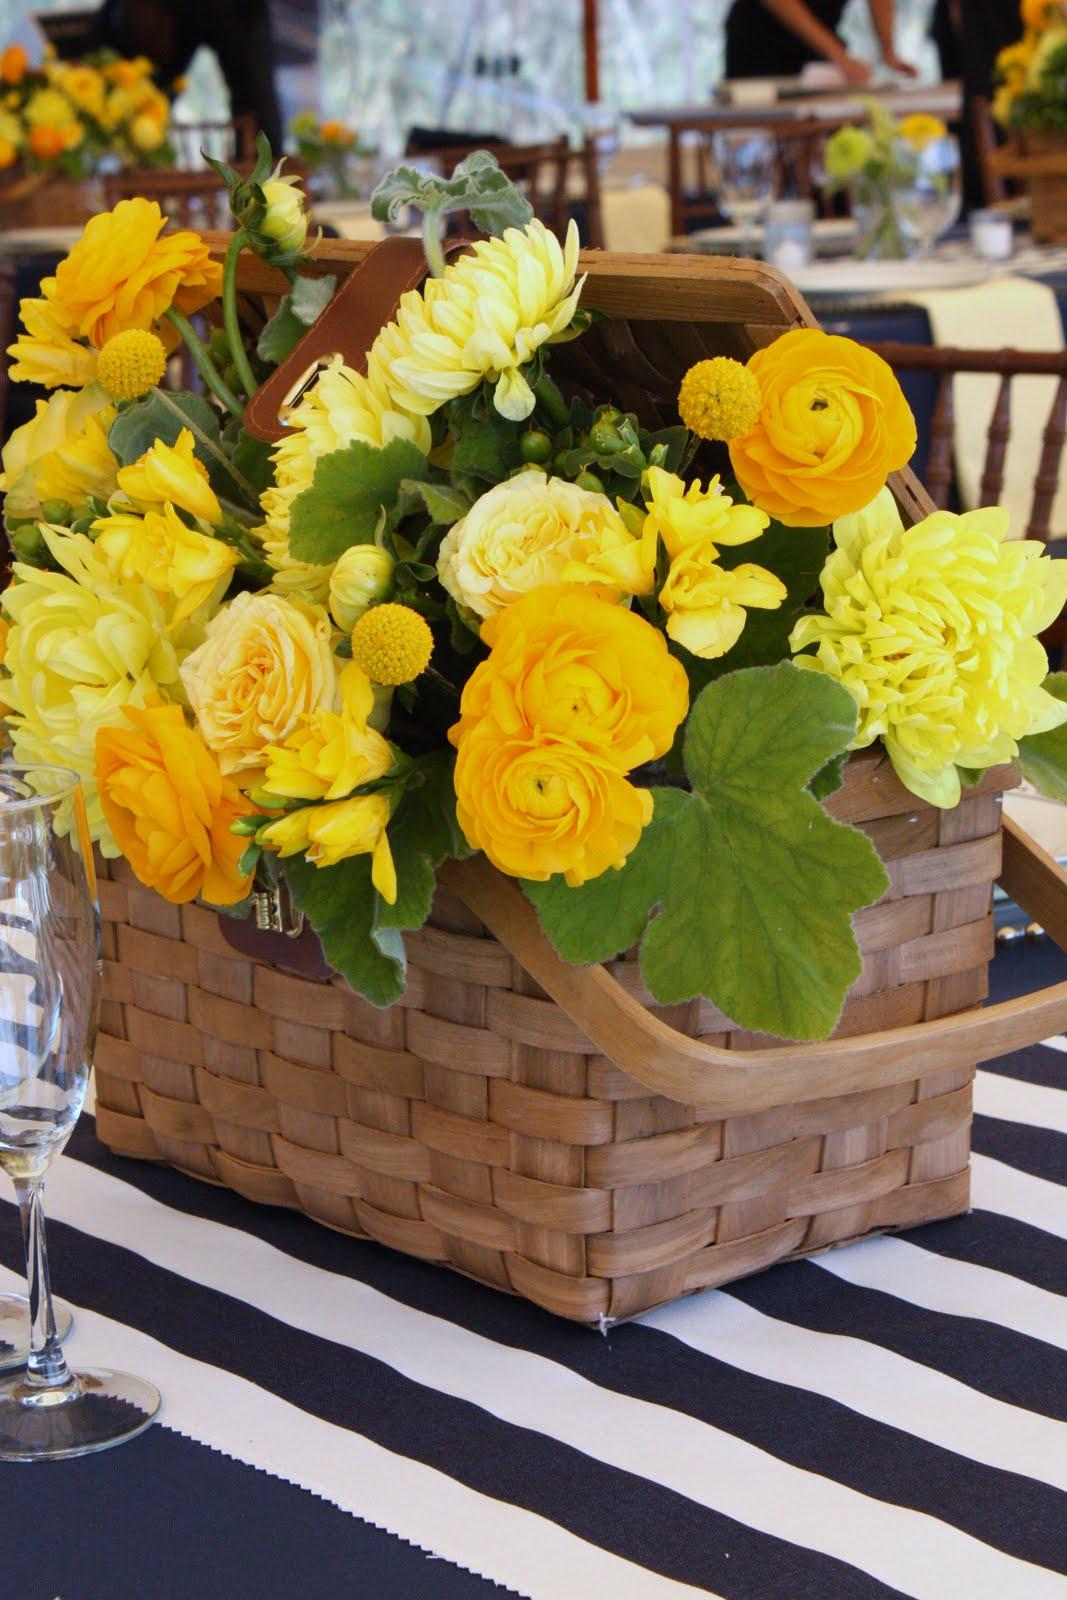 BLUSH Floral Design Yacht Club Navy And Yellow Preppy Wedding